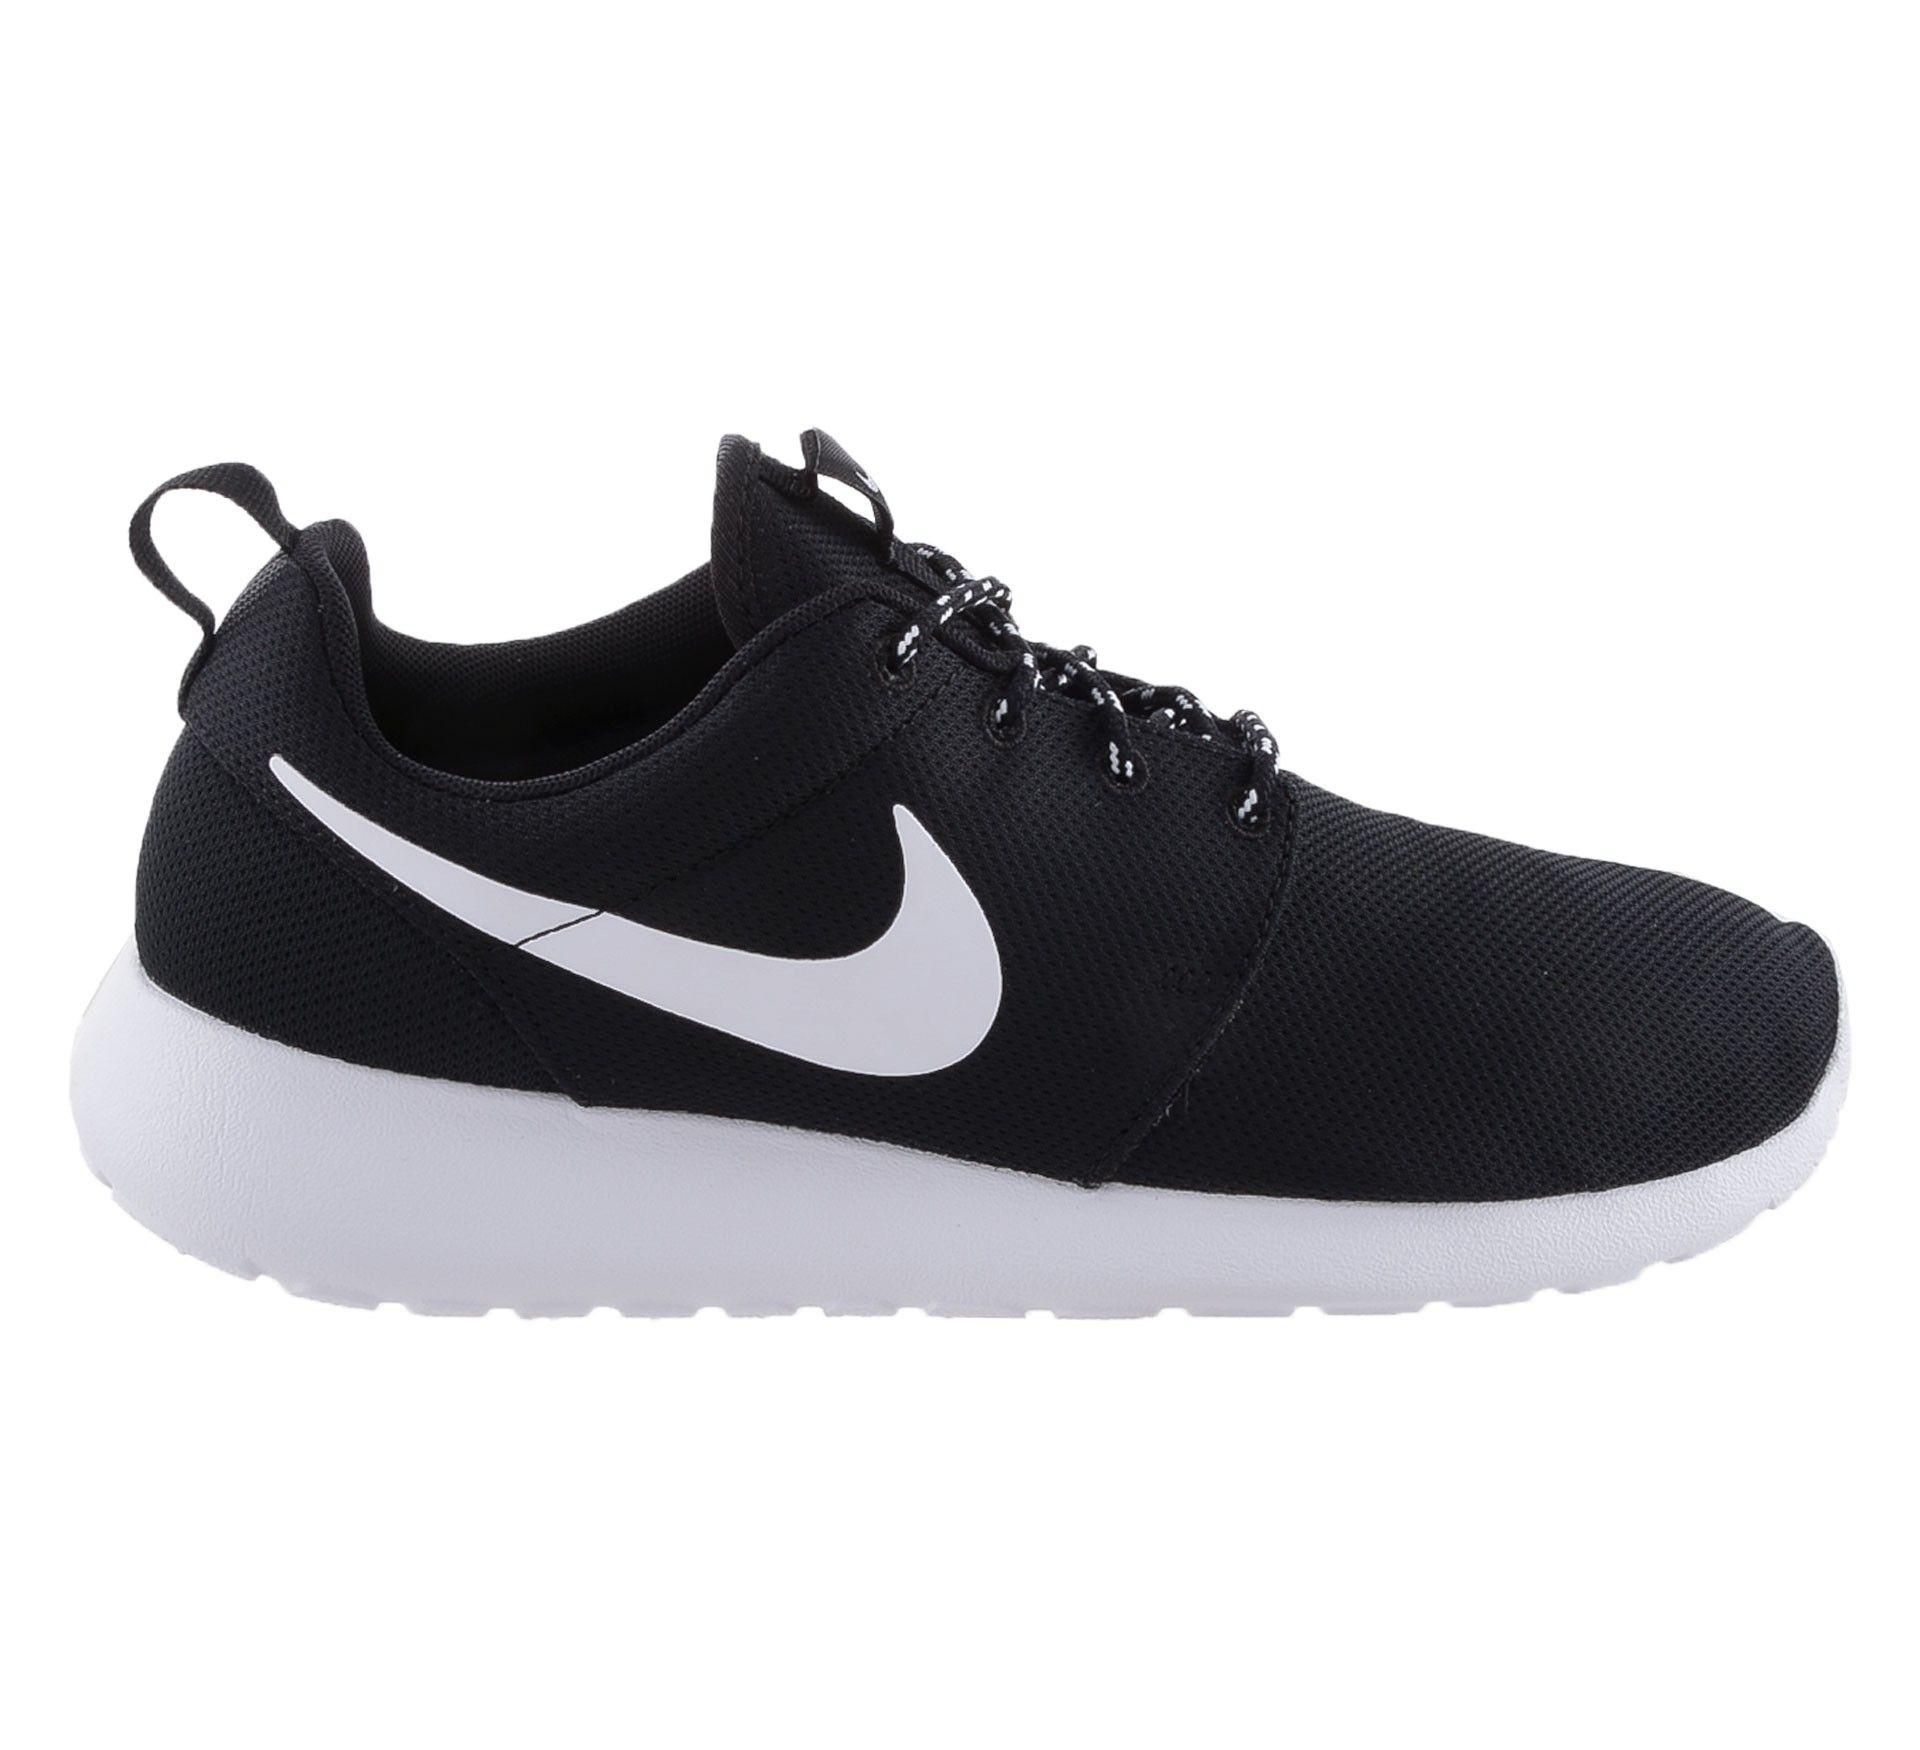 nike schoenen zwart